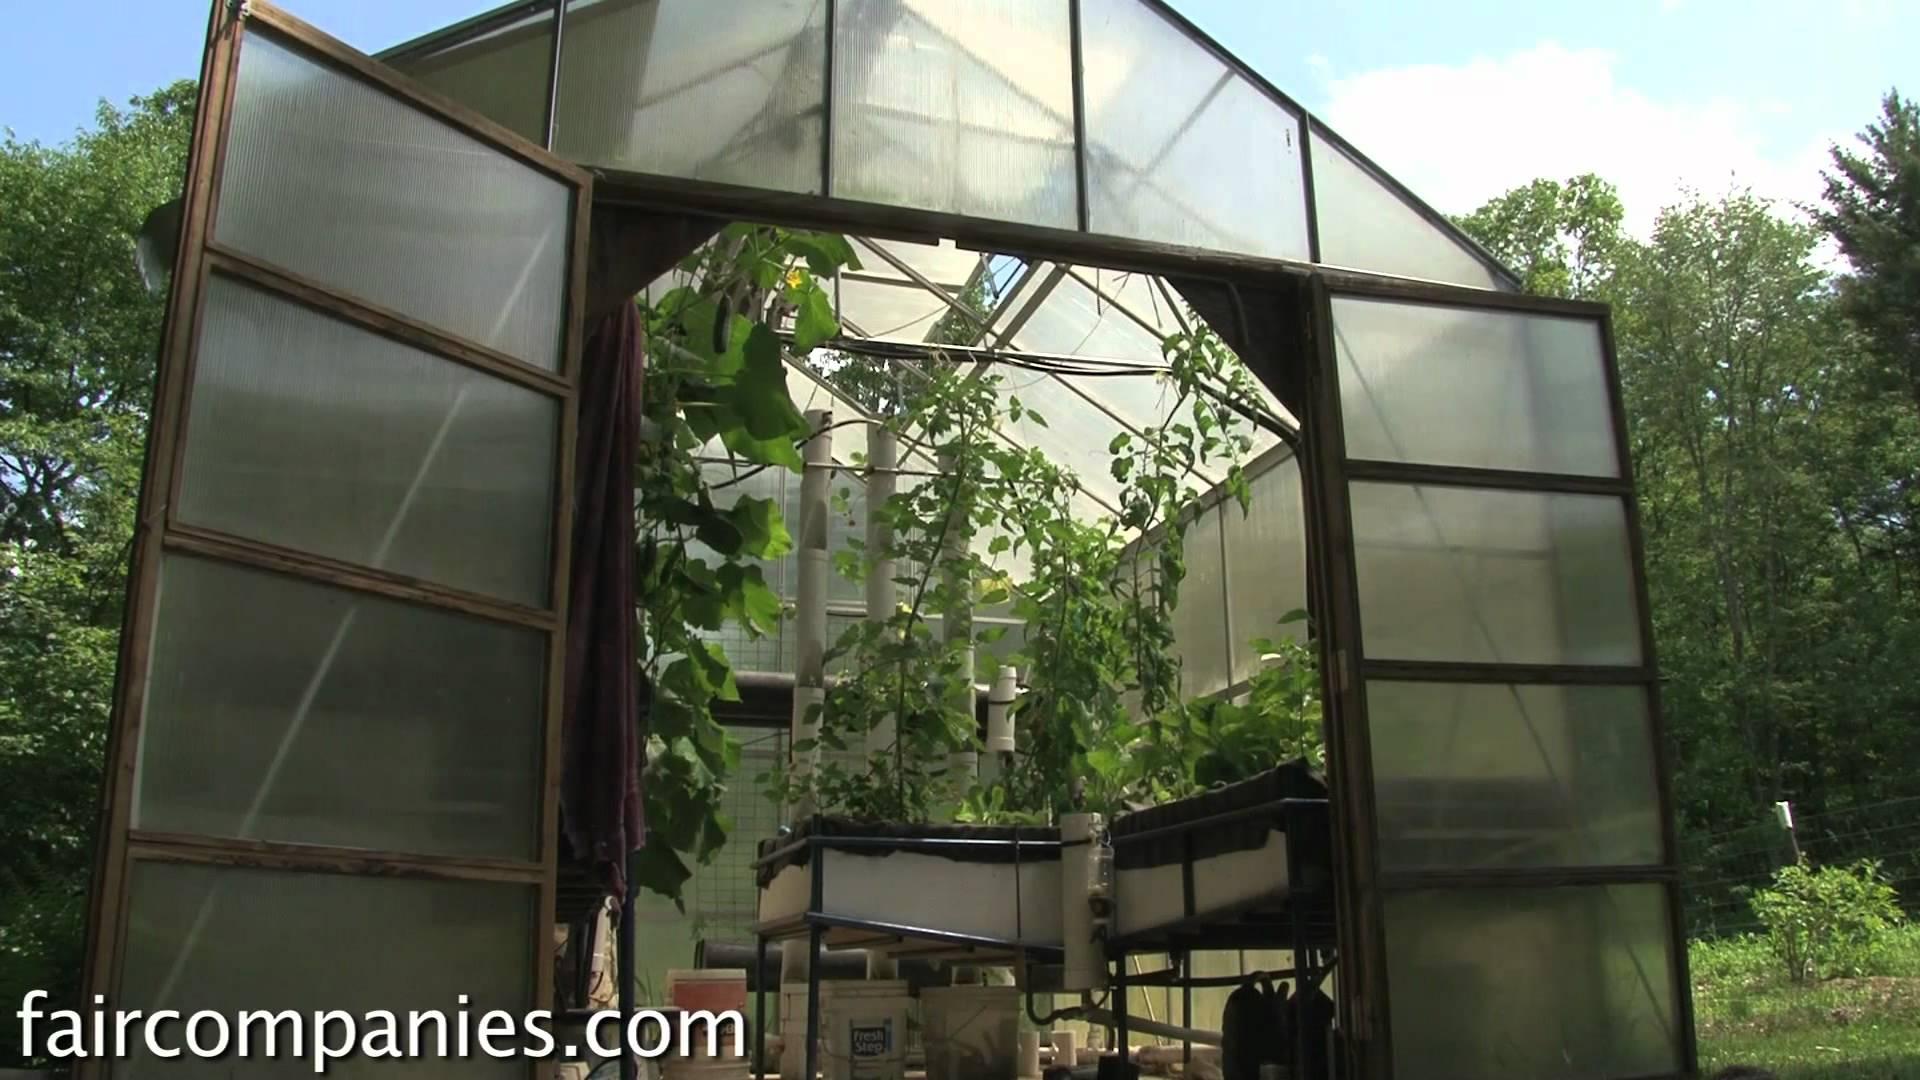 backyard aquaponics system design pdf